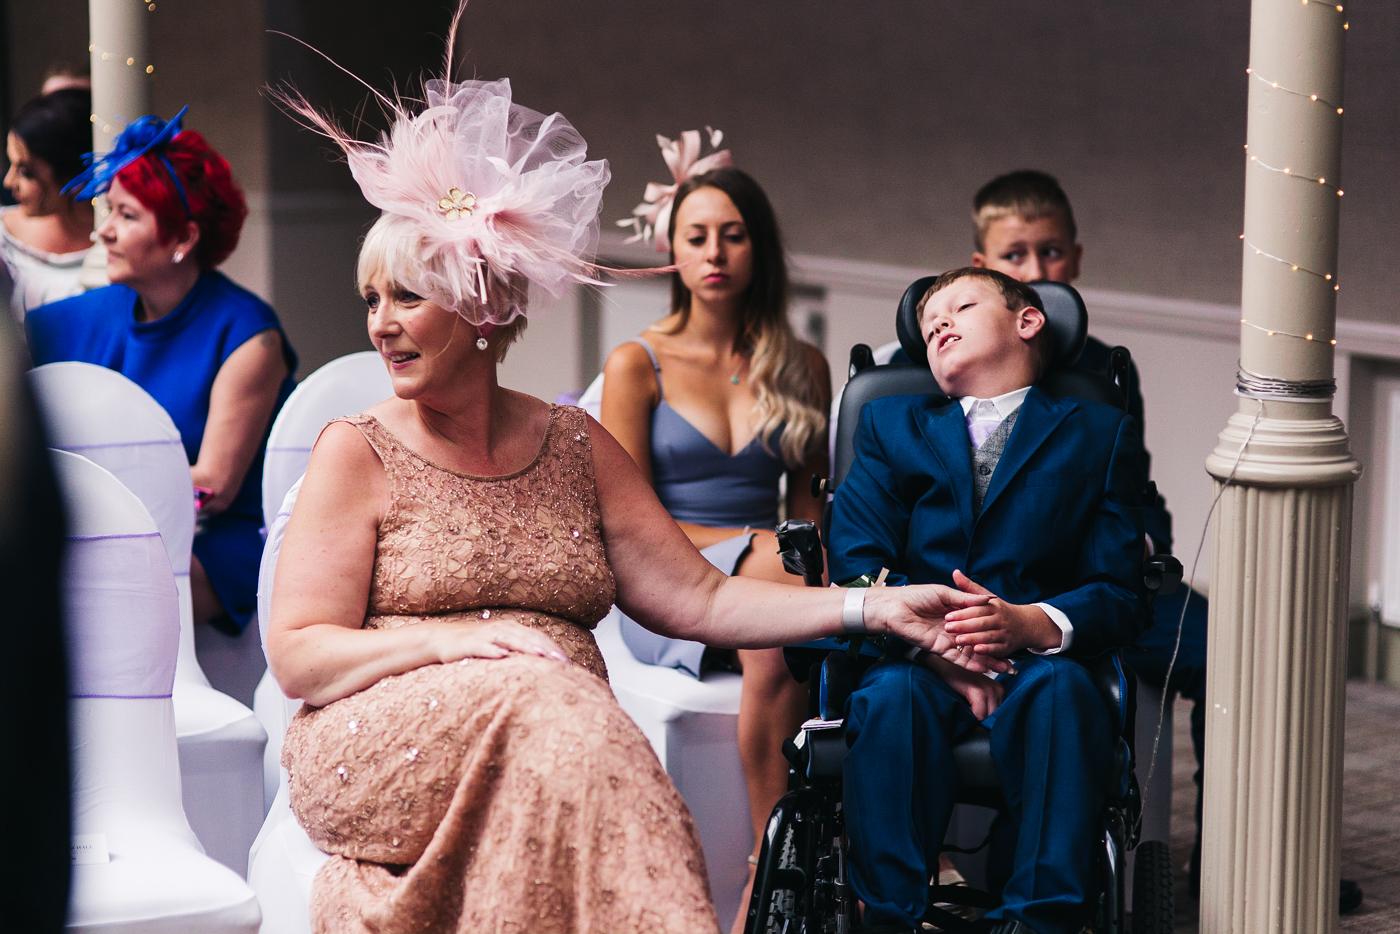 headlame-hall-north-yorkshire-north-east-photographer-wedding-0019.jpg